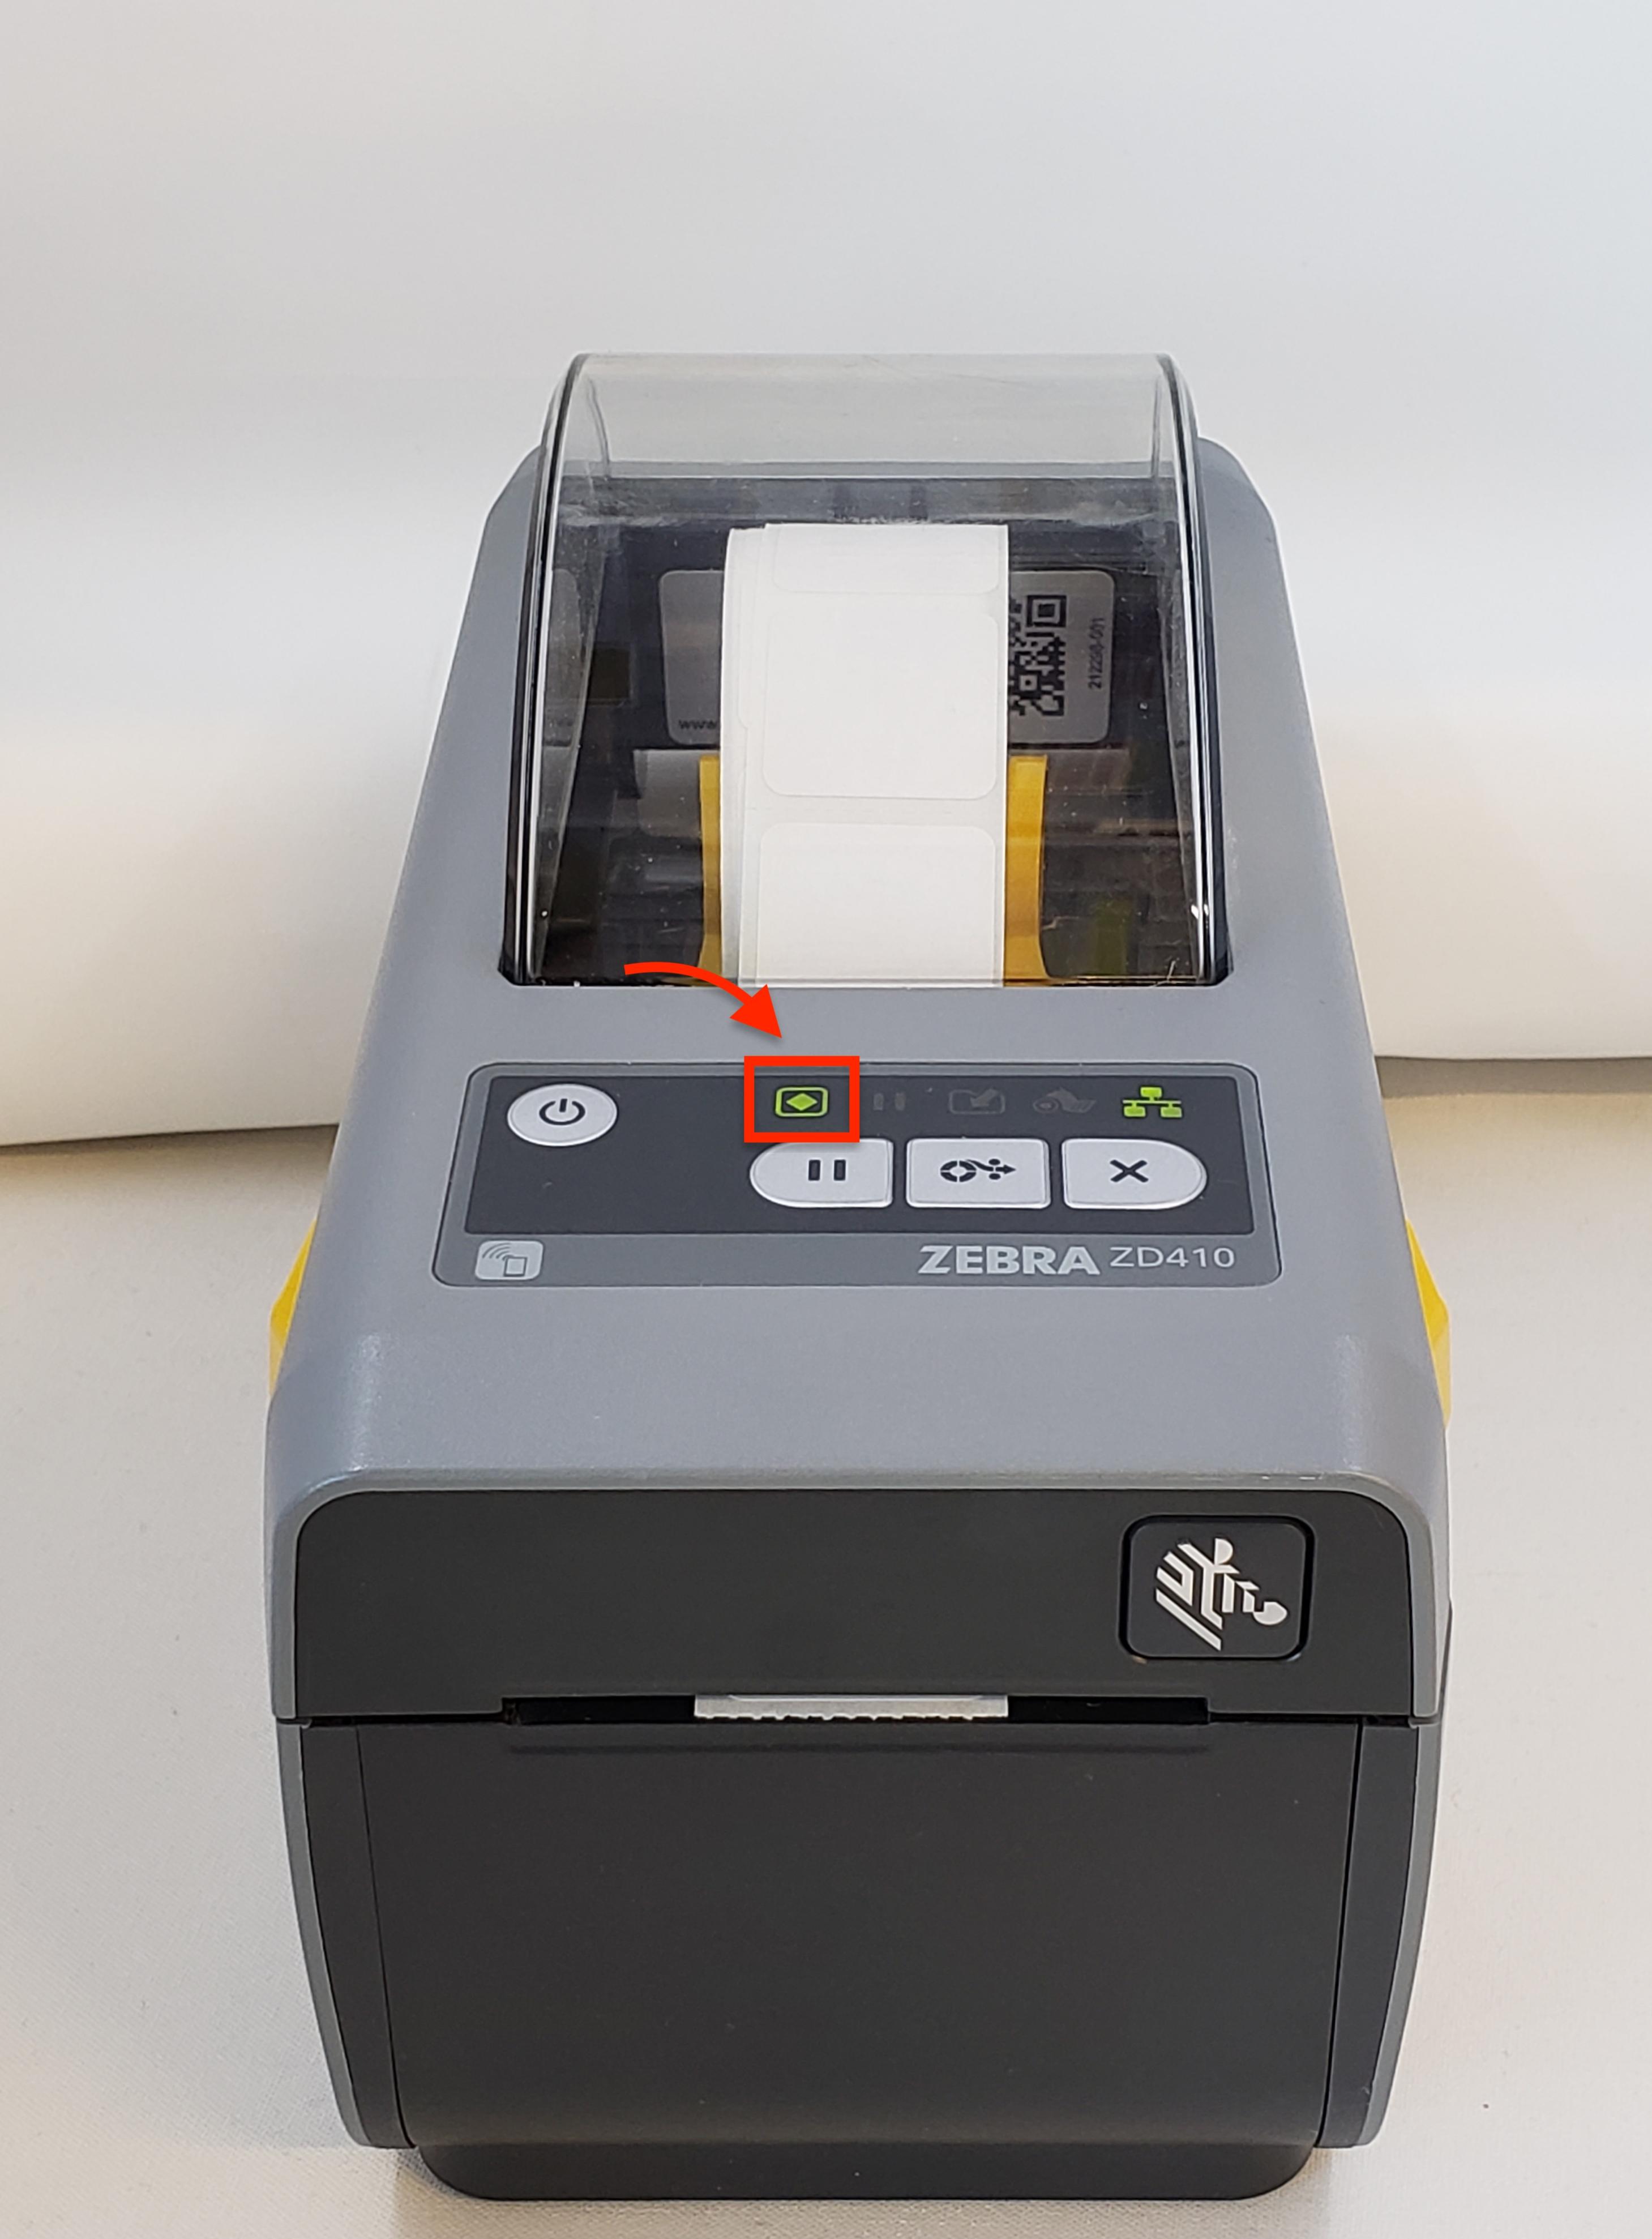 Factory Reset Zebra Printers